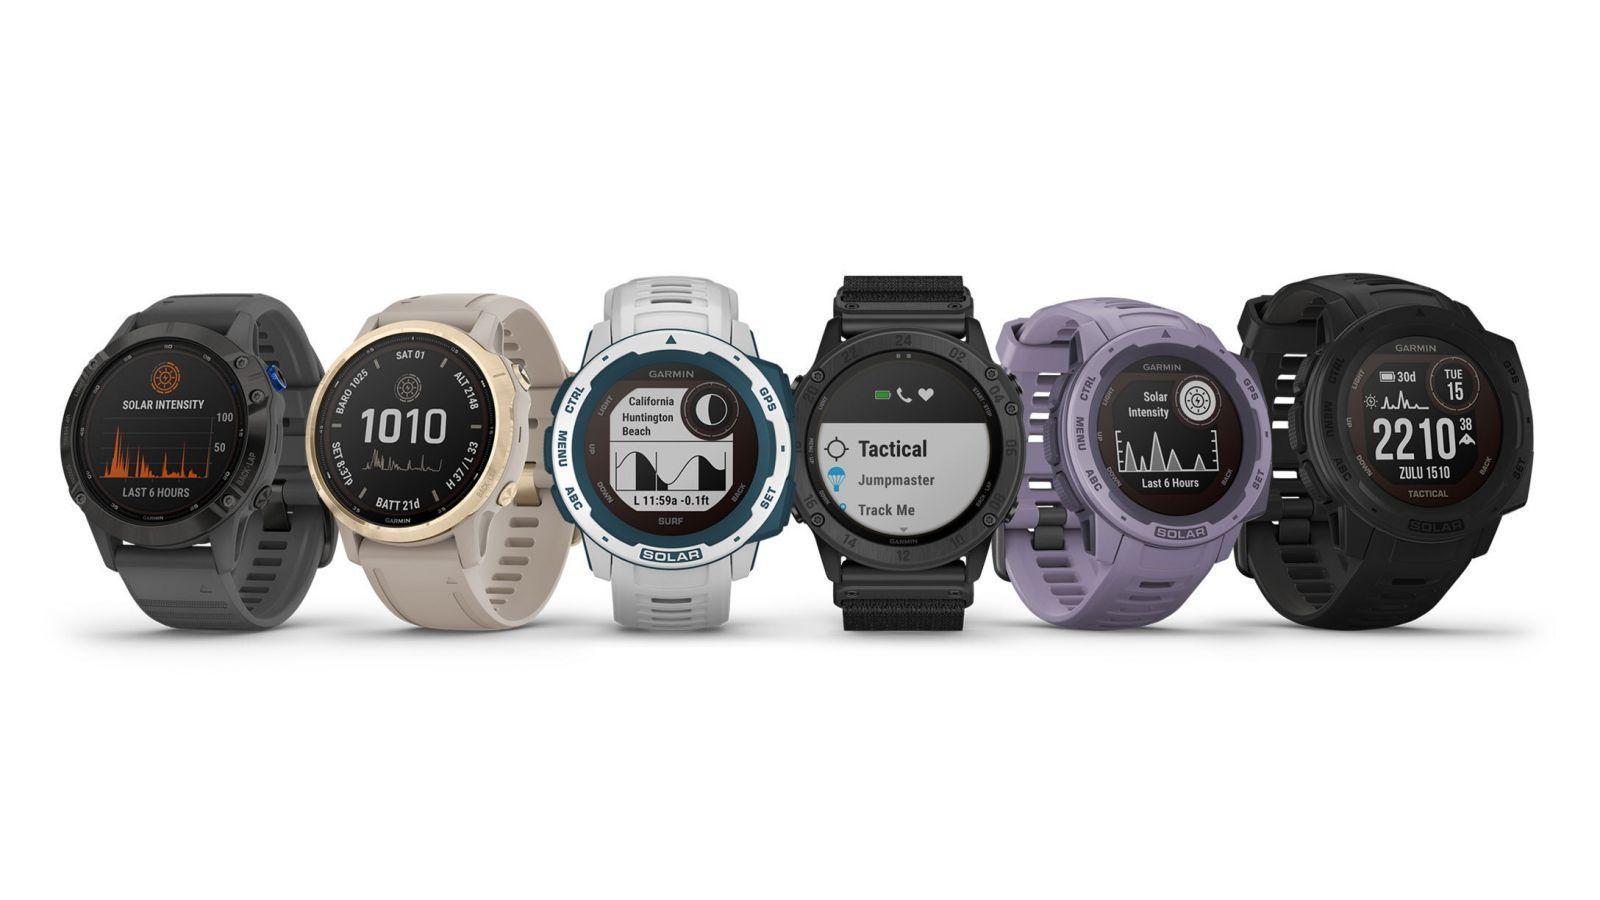 Garmin запускает новые умные часы на солнечных батареях (garmin solar smartwatches)